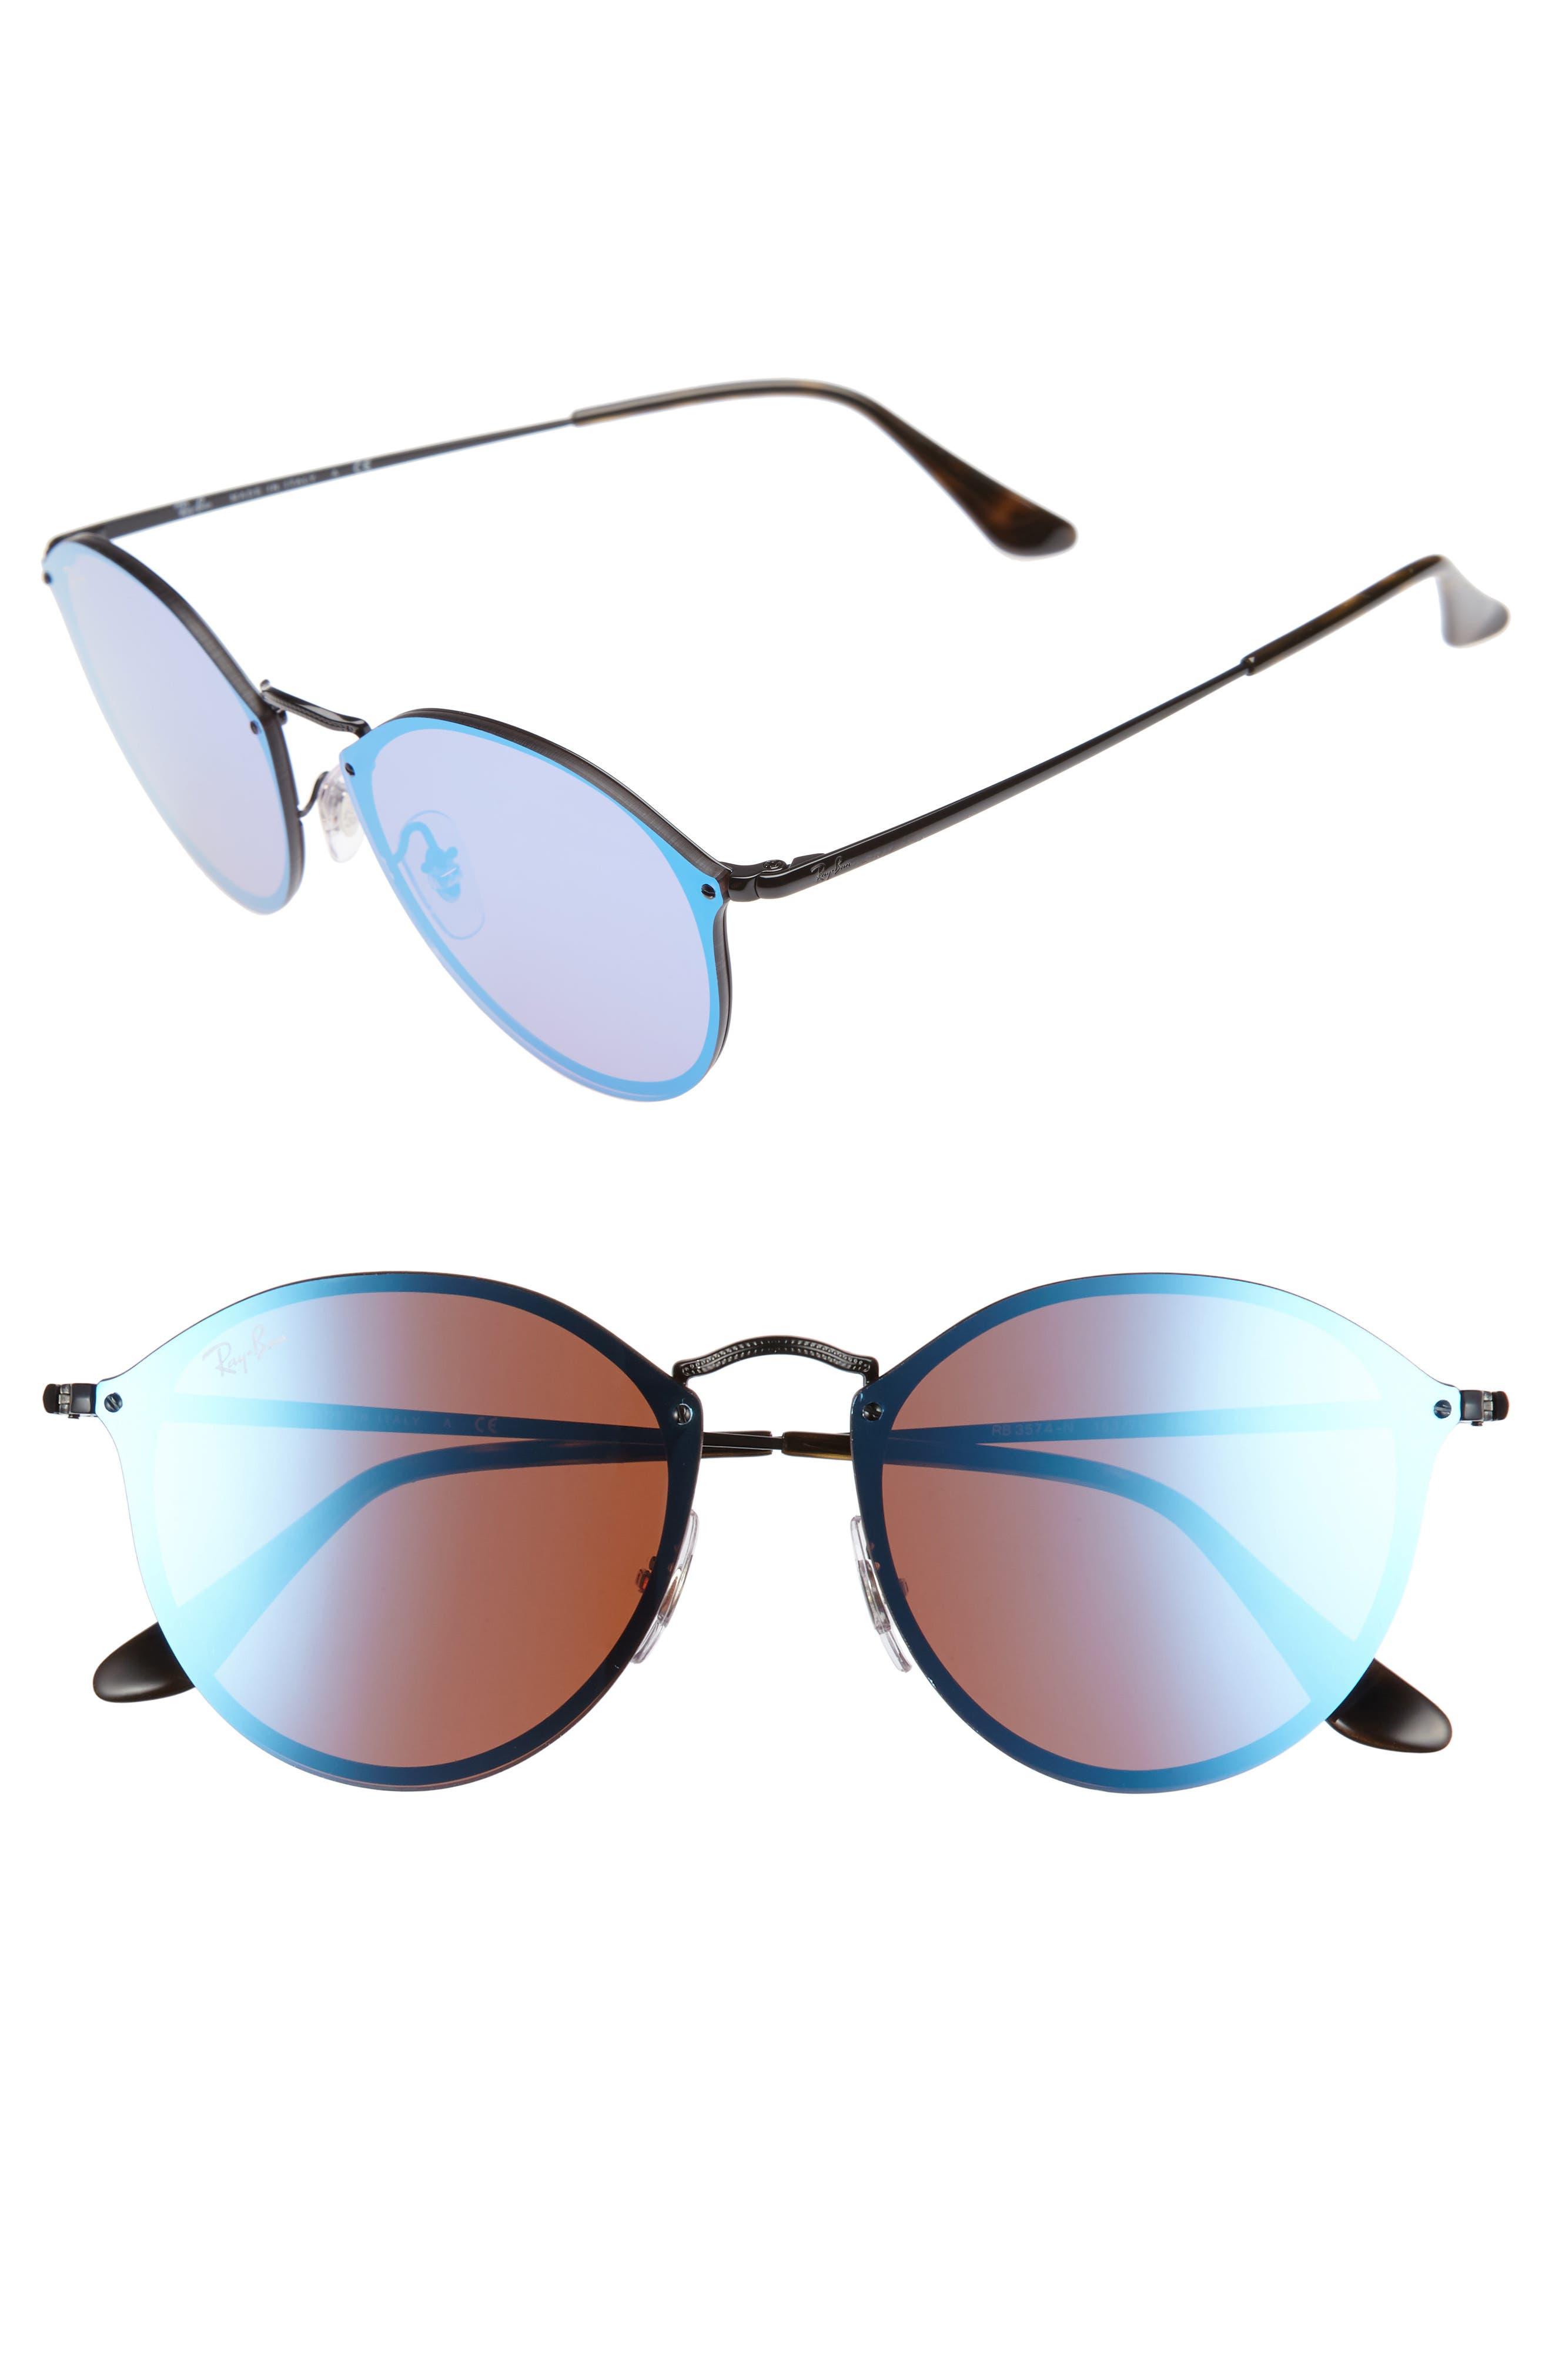 59mm Blaze Round Mirrored Sunglasses,                             Main thumbnail 1, color,                             001